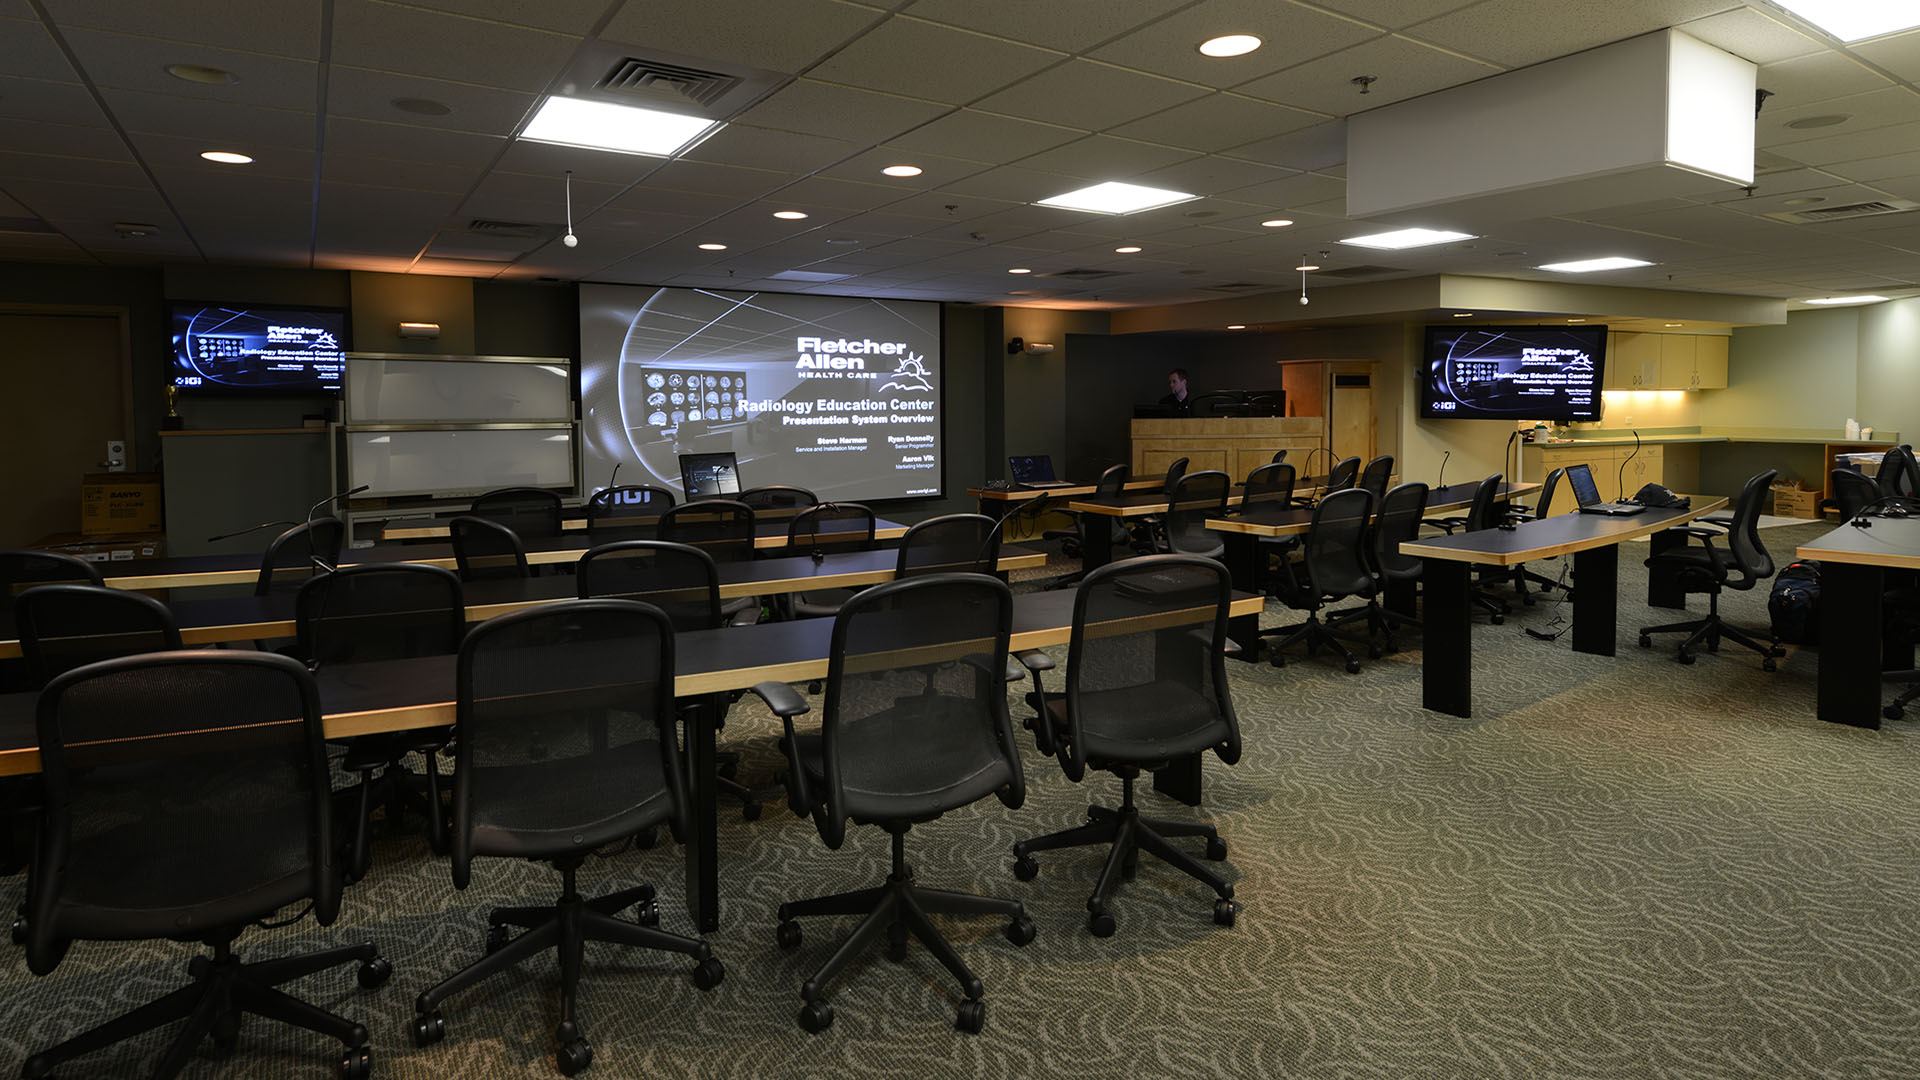 health system 4K custom projection system powerwall